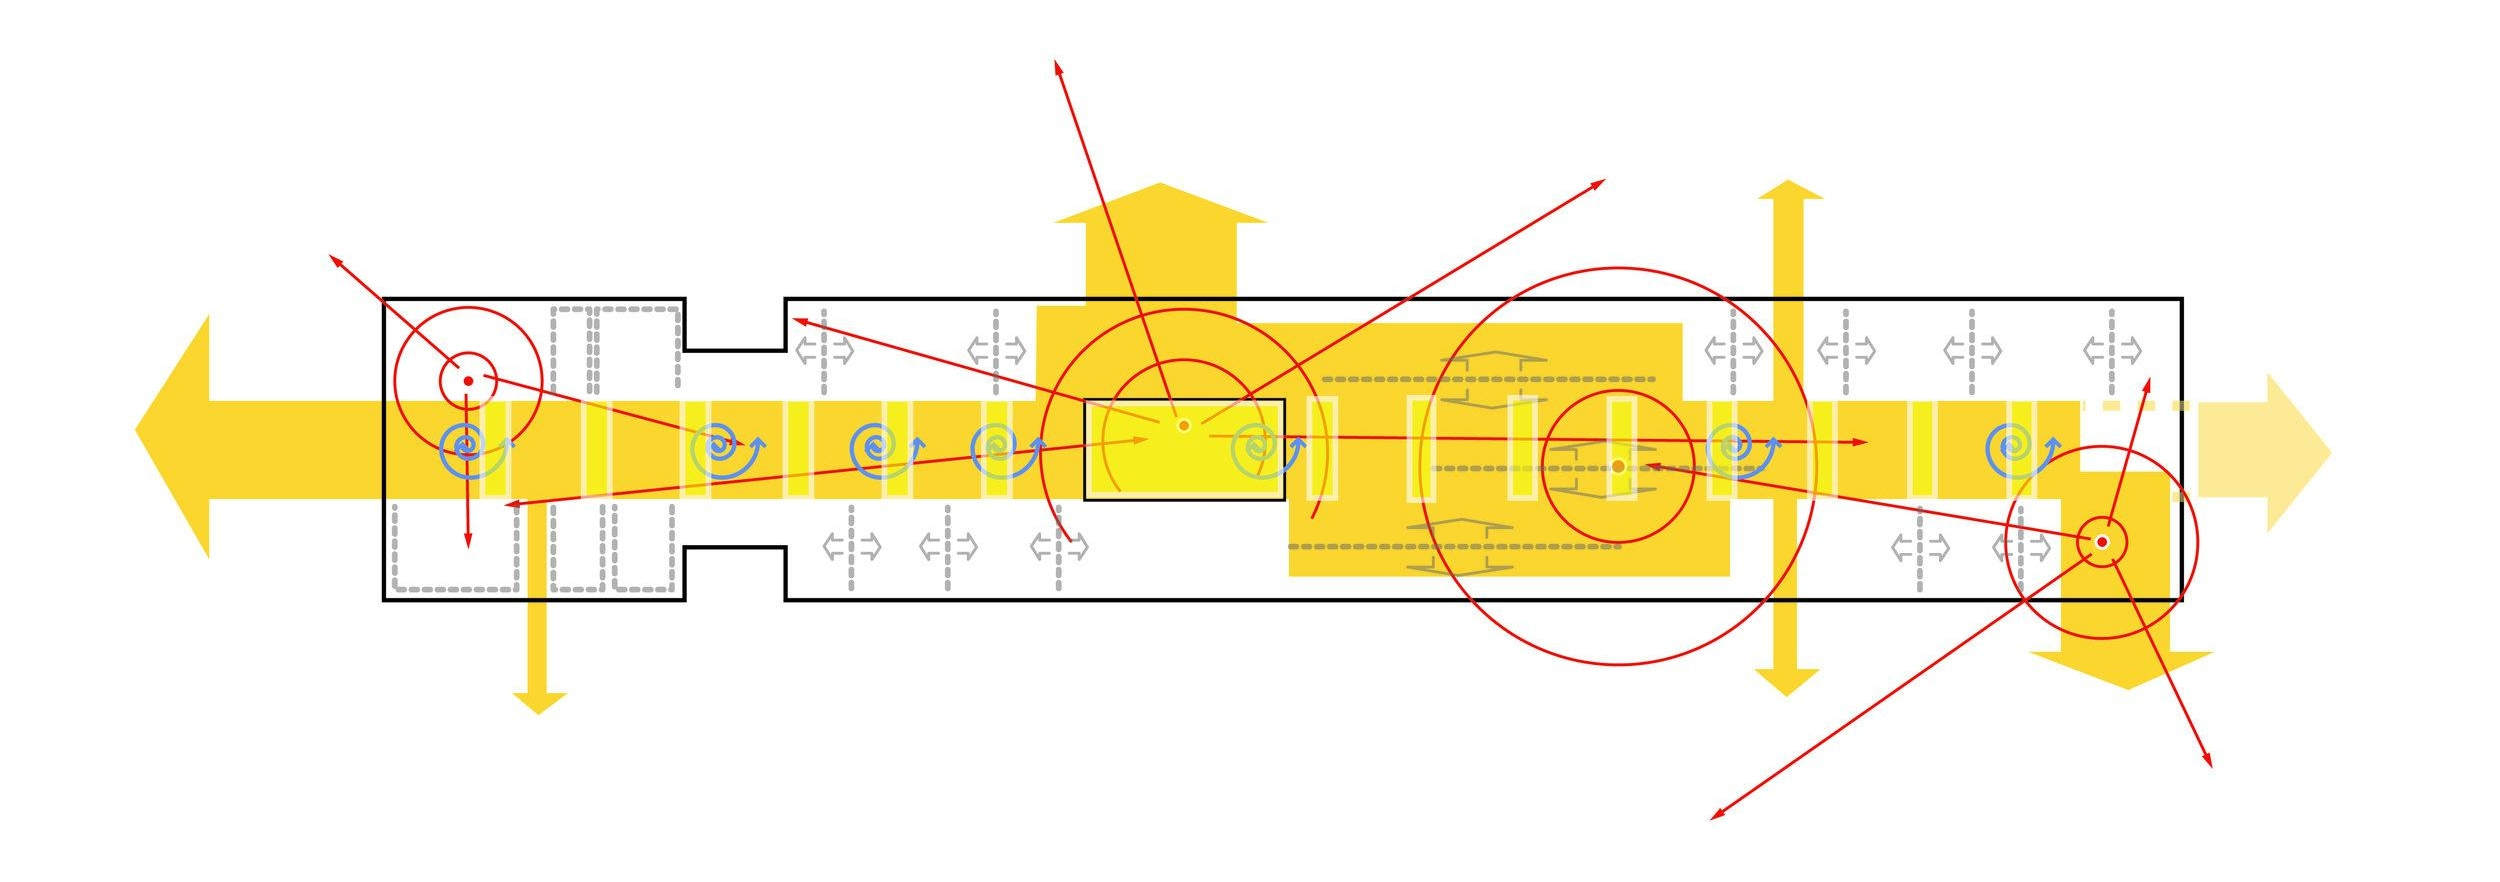 spatial organization sketch-01.jpg